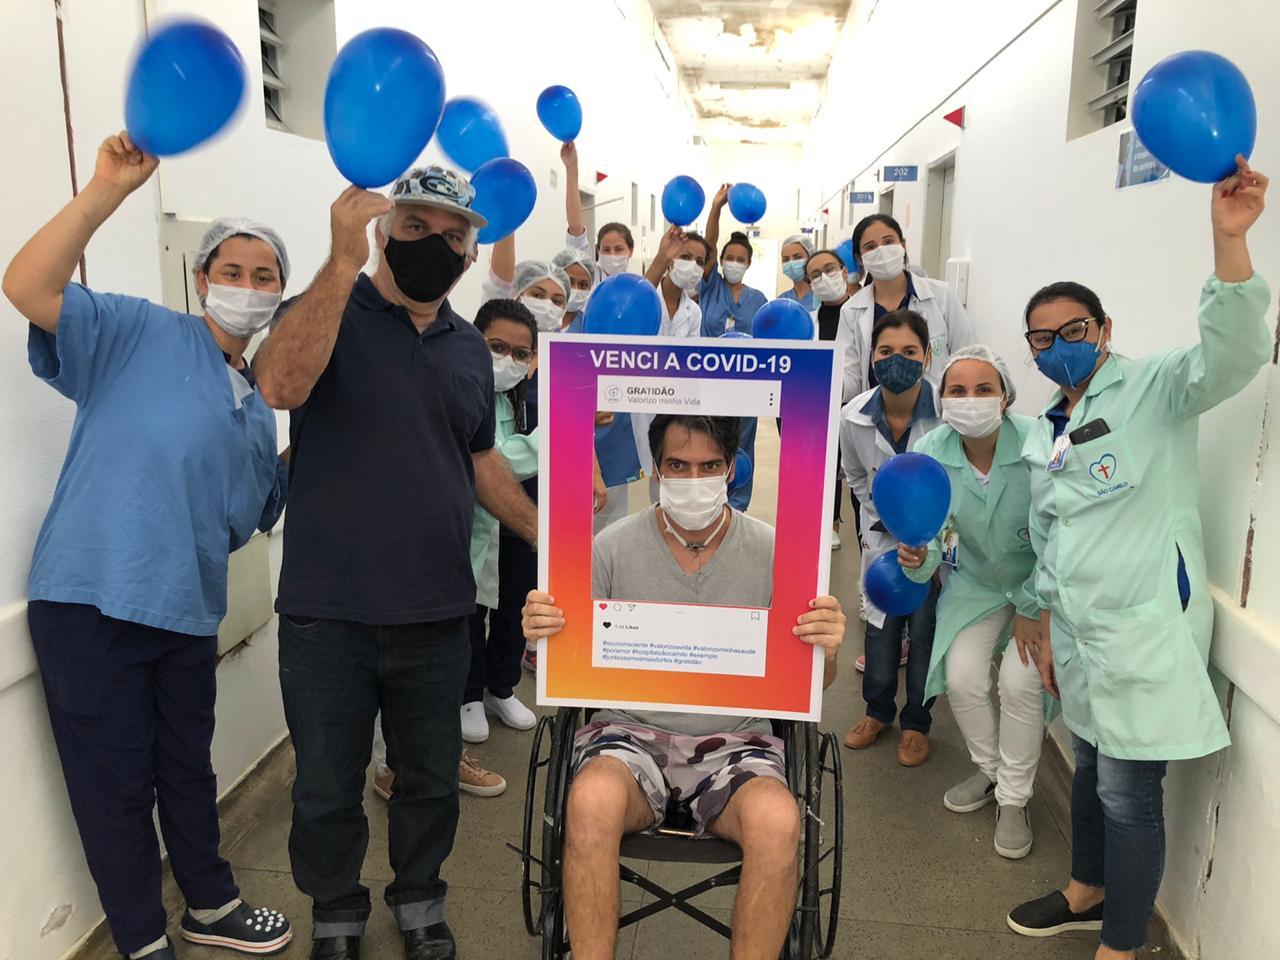 Morador de Iconha que venceu o covid 19 é surpreendido na saída do hospital